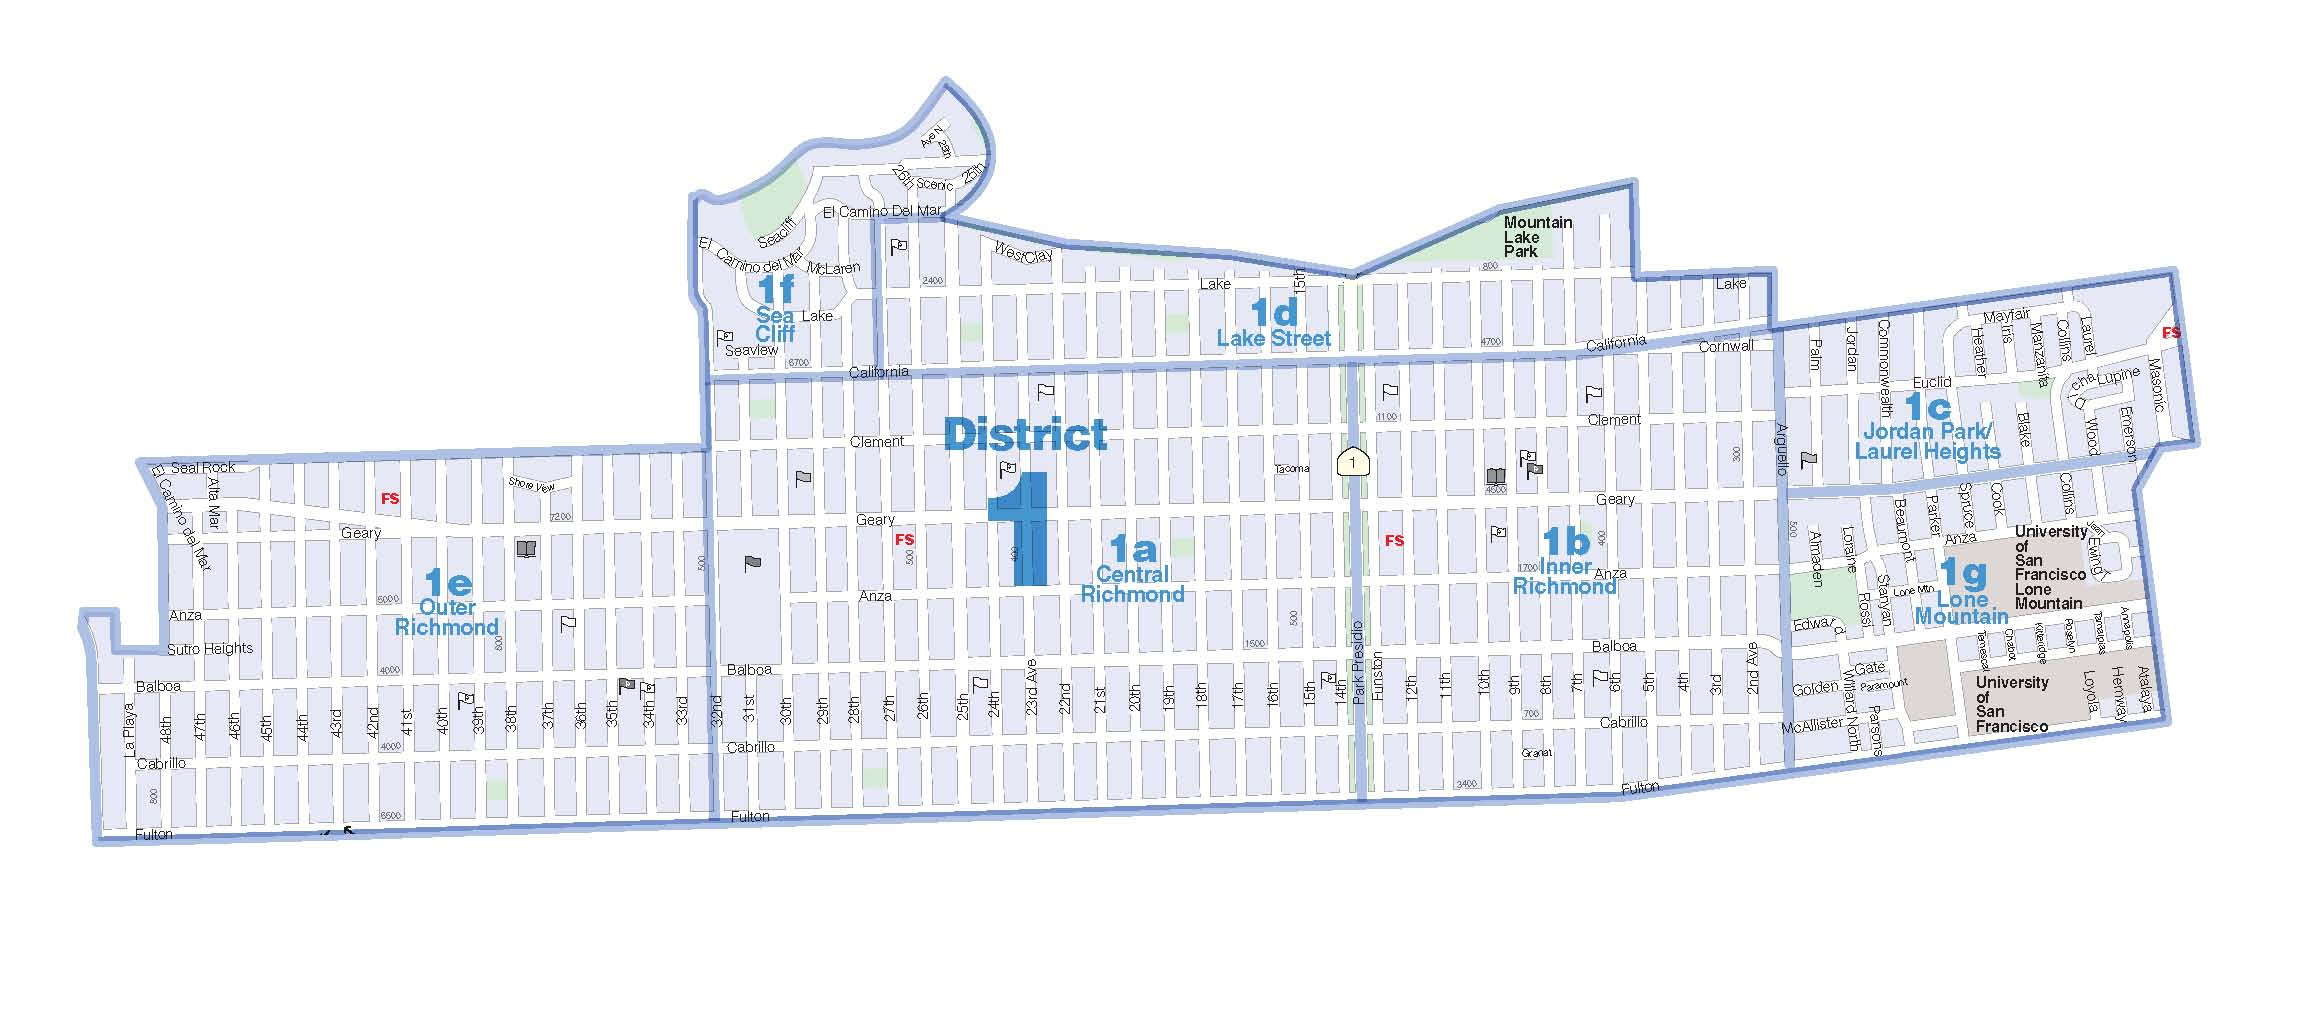 District 1 - Northwest  Sea Cliff, Lake, Jordan Park/Laurel Heights, Outer Richmond, Central Richmond, Inner Richmond, Lone Mountain